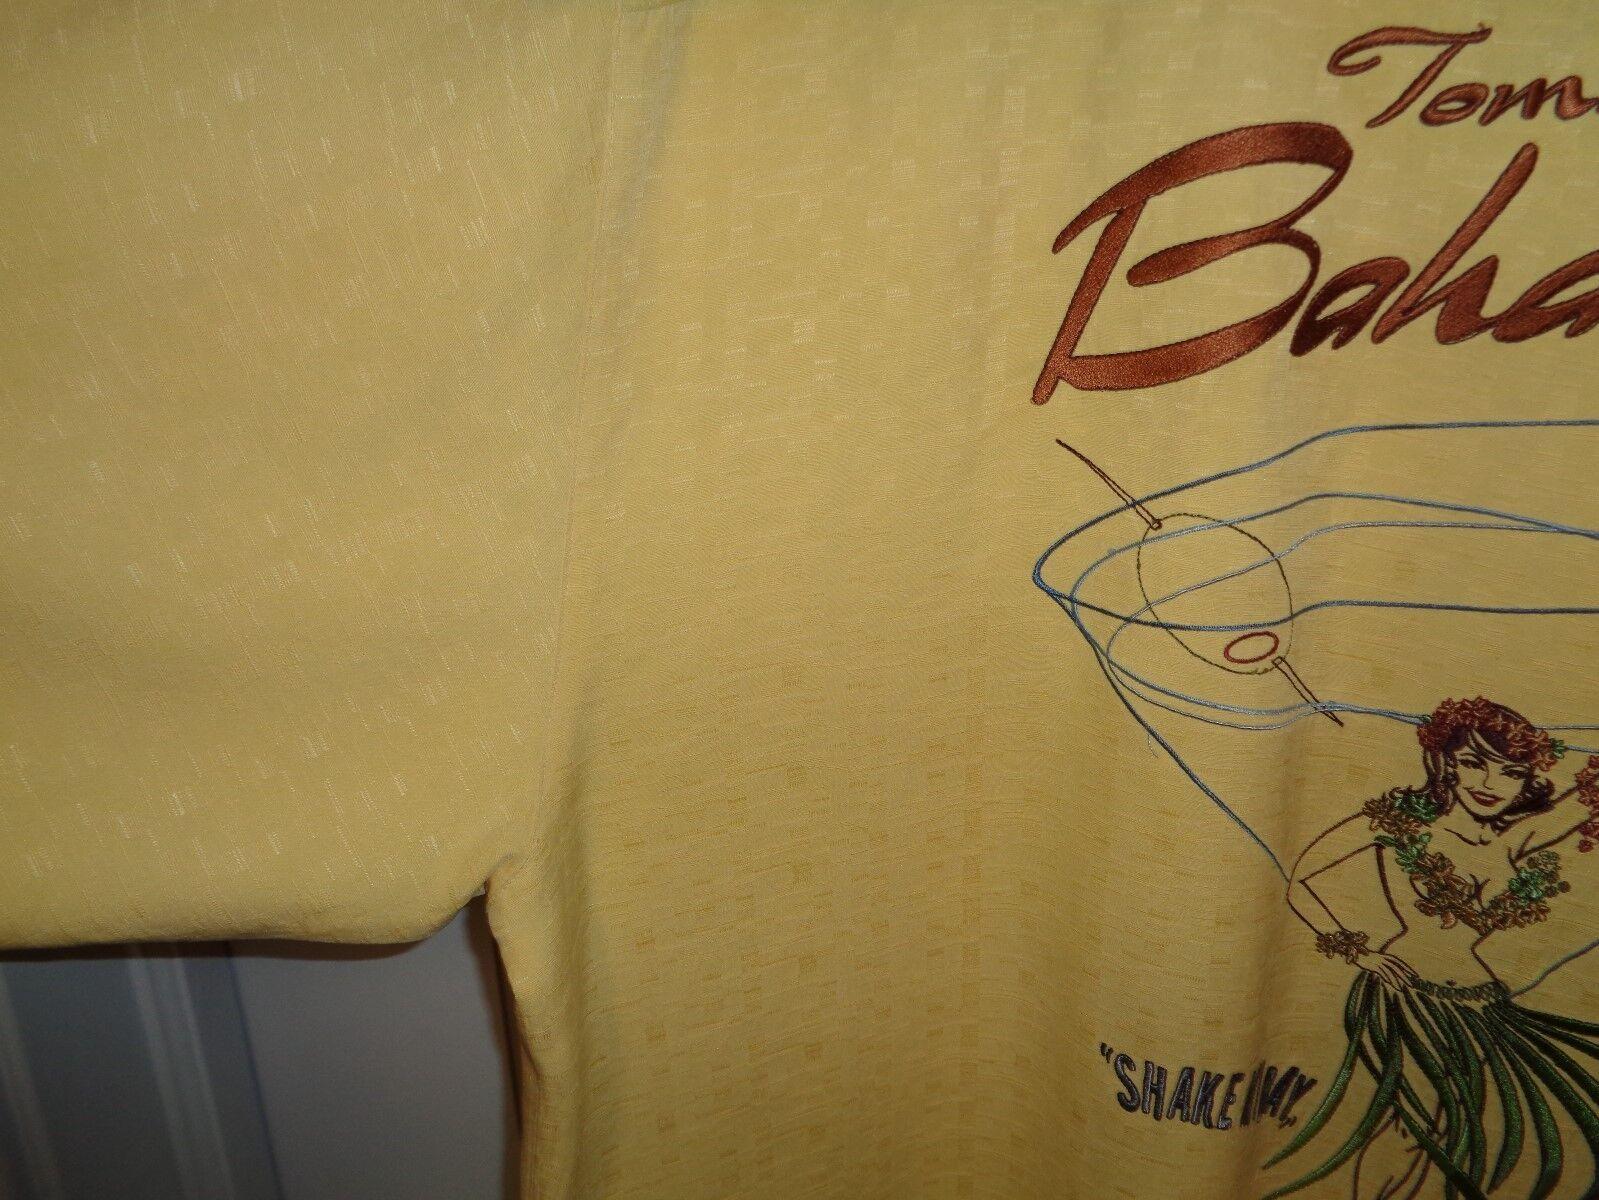 TOMMY BAHAMA EMBROIDERED SHAKE MY DAY SILK DRESS CASUAL HAWAIIAN SHIRT SZ MED - $34.99